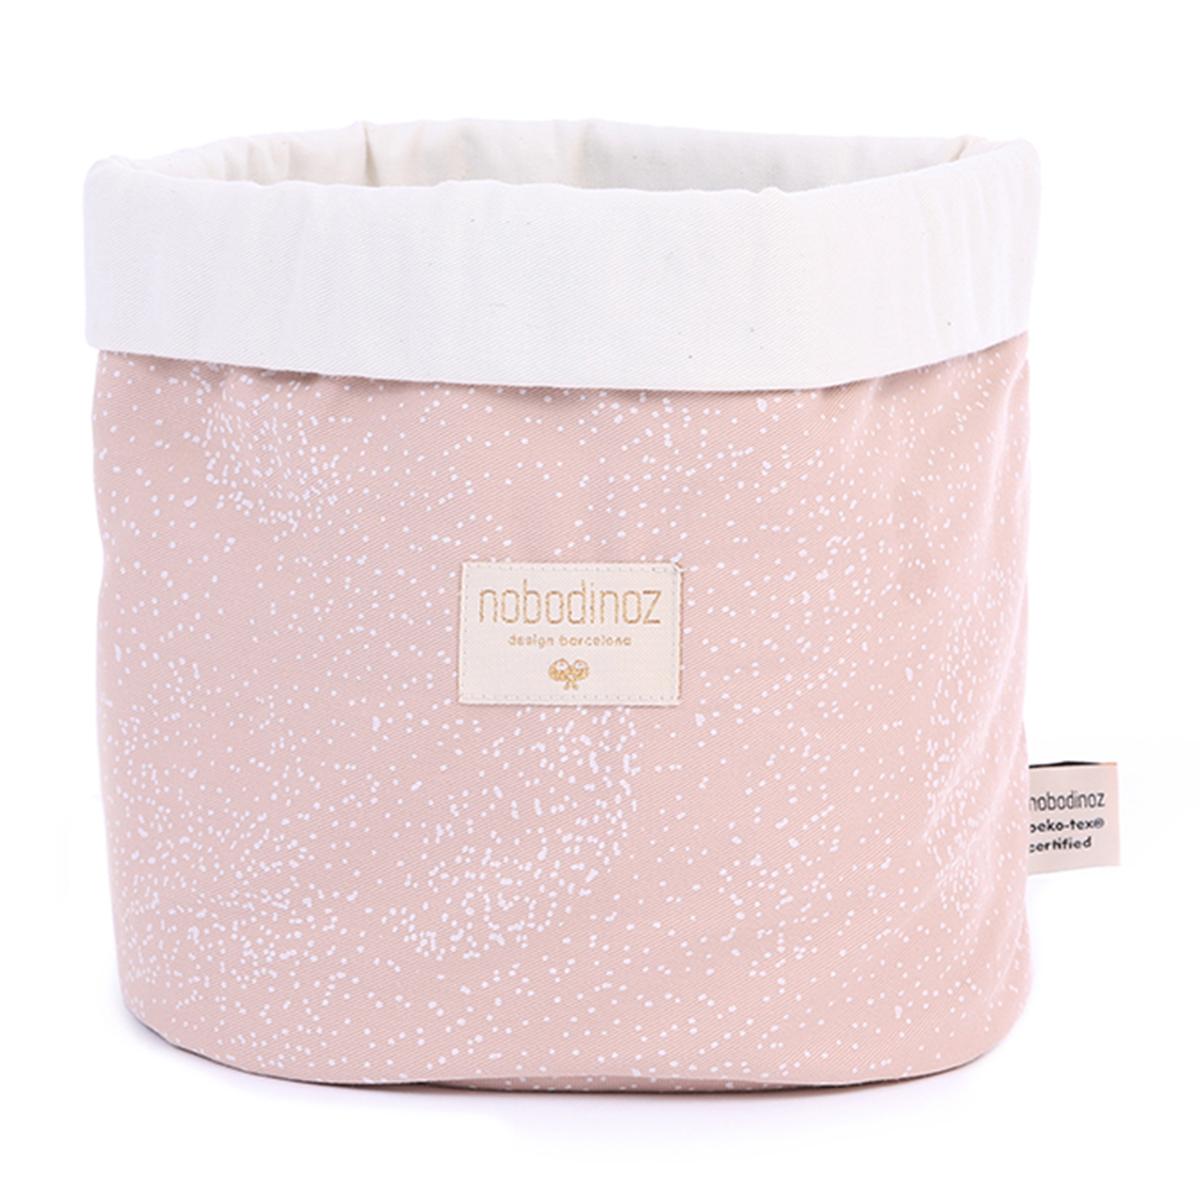 Panier & corbeille Panier de Rangement Panda Medium - White Bubble & Misty Pink